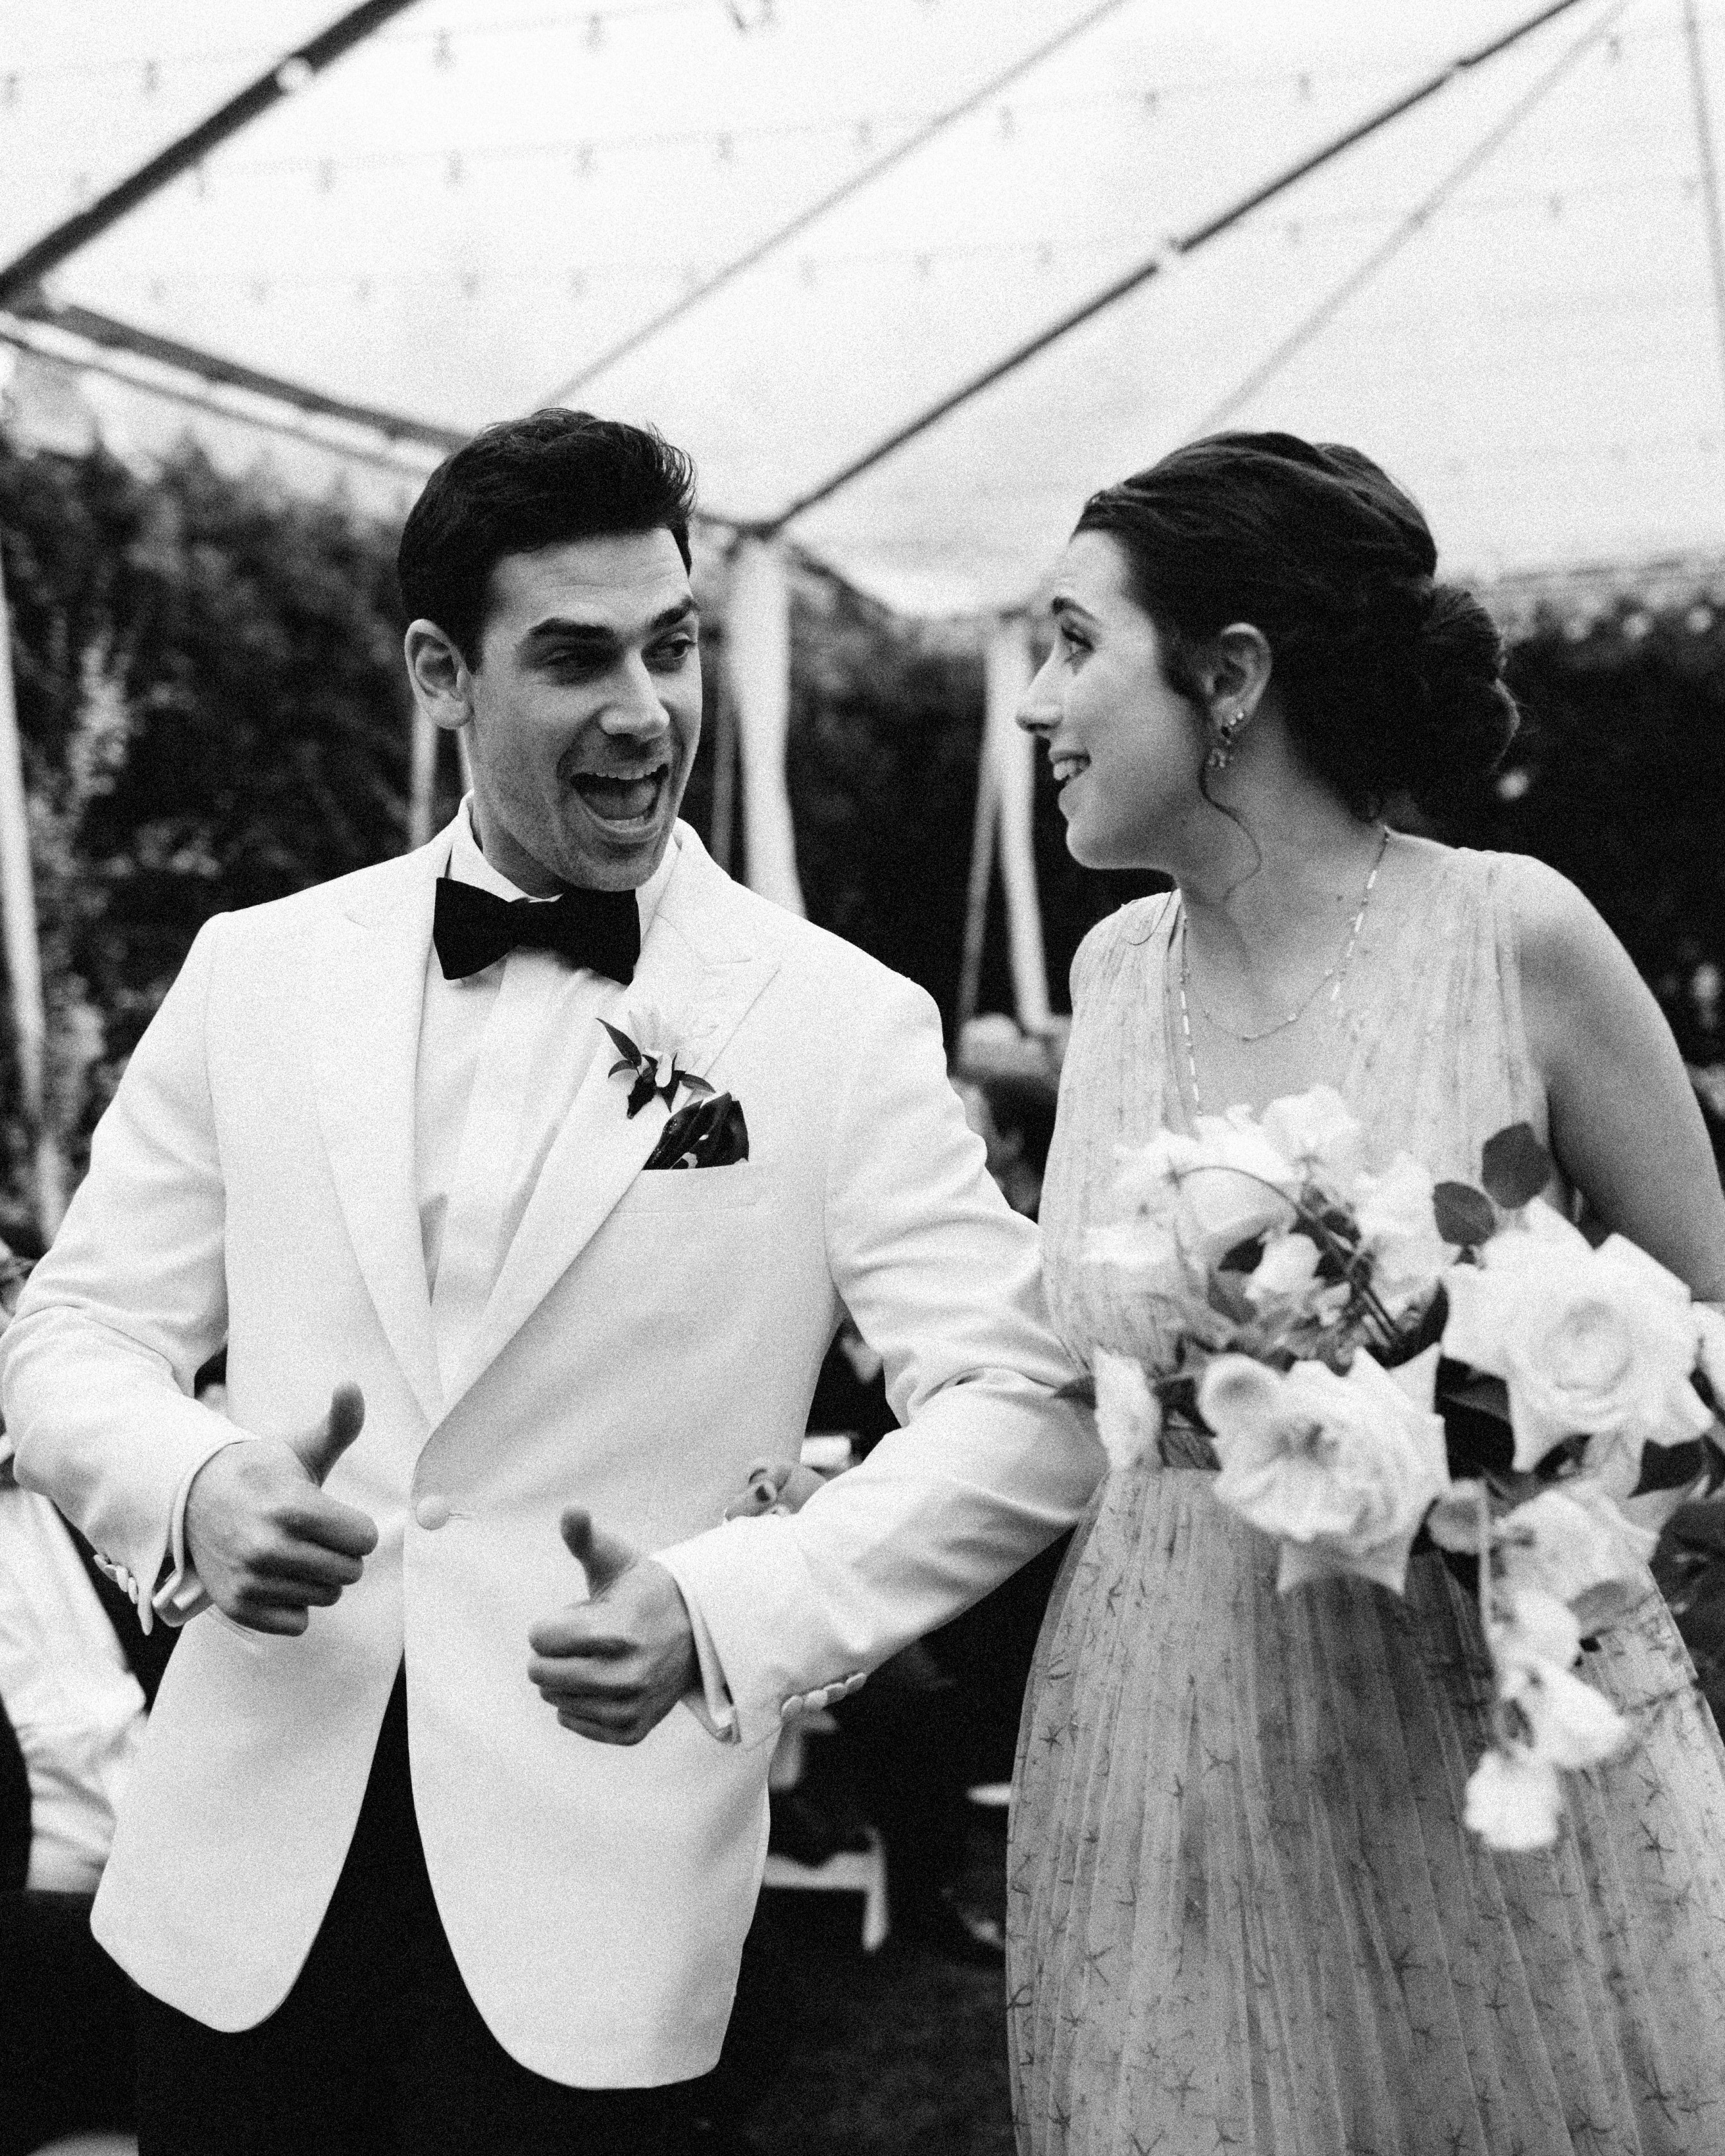 mia patrick wedding party bridesmaid groom thumbs up